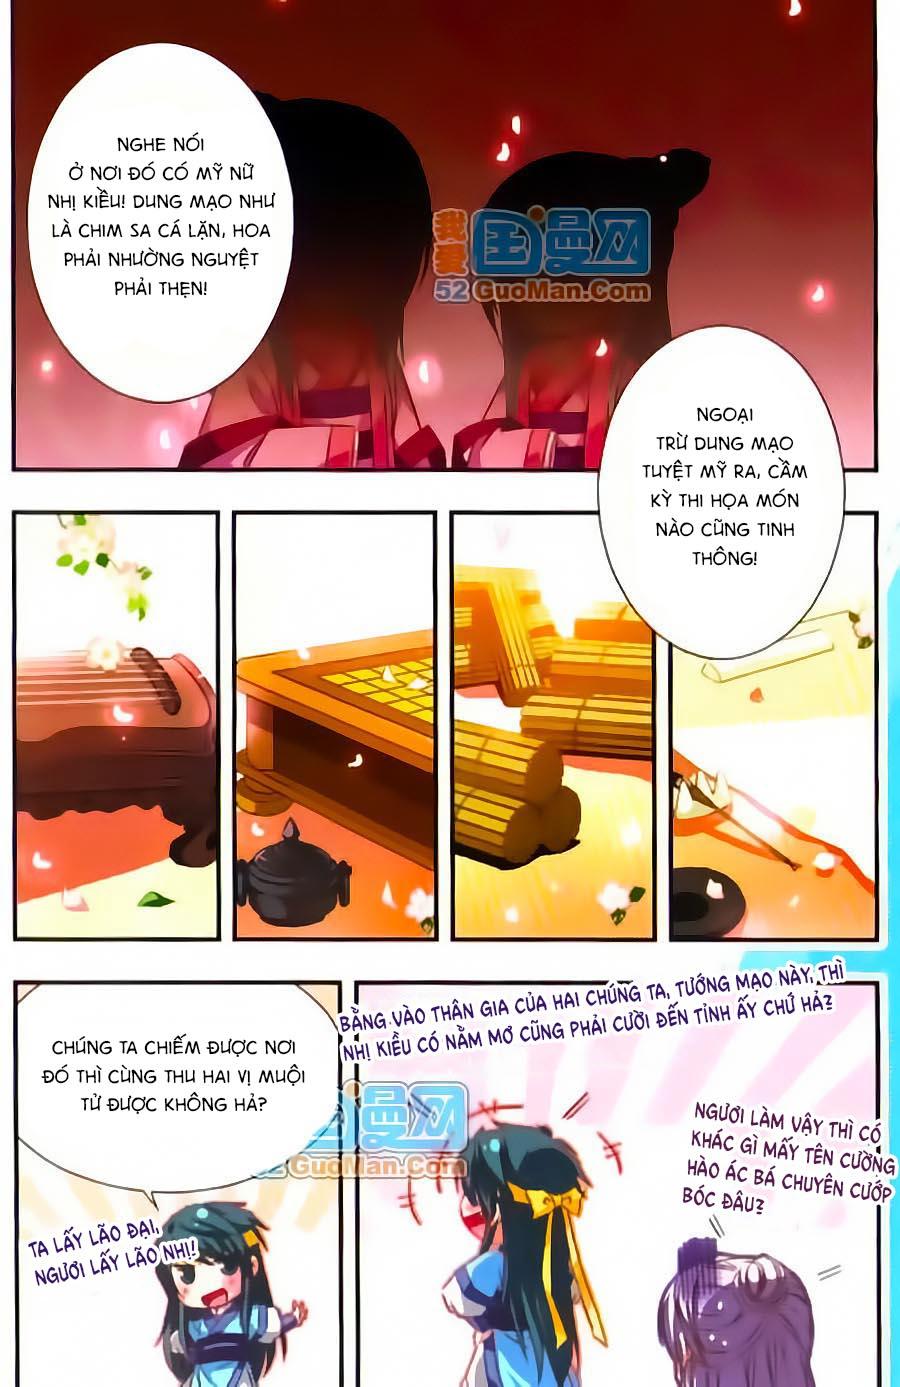 Manh Tam Quốc Chap 53.5 - Next Chap 54